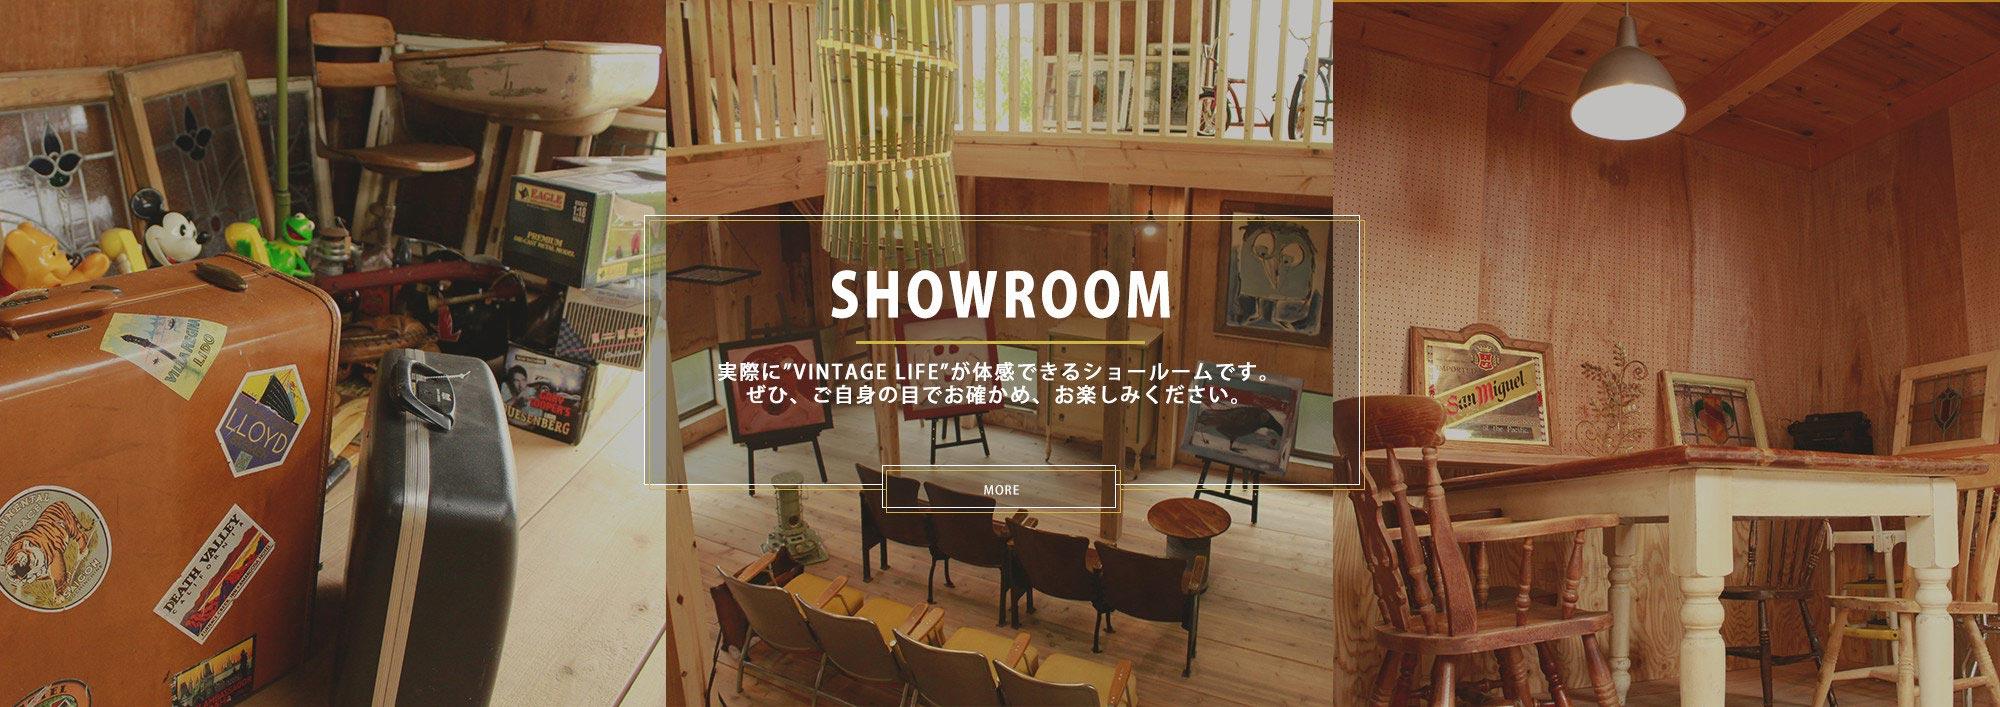 SHOWROOM 実際にVINTAGE LIFEが体感できるショールーム